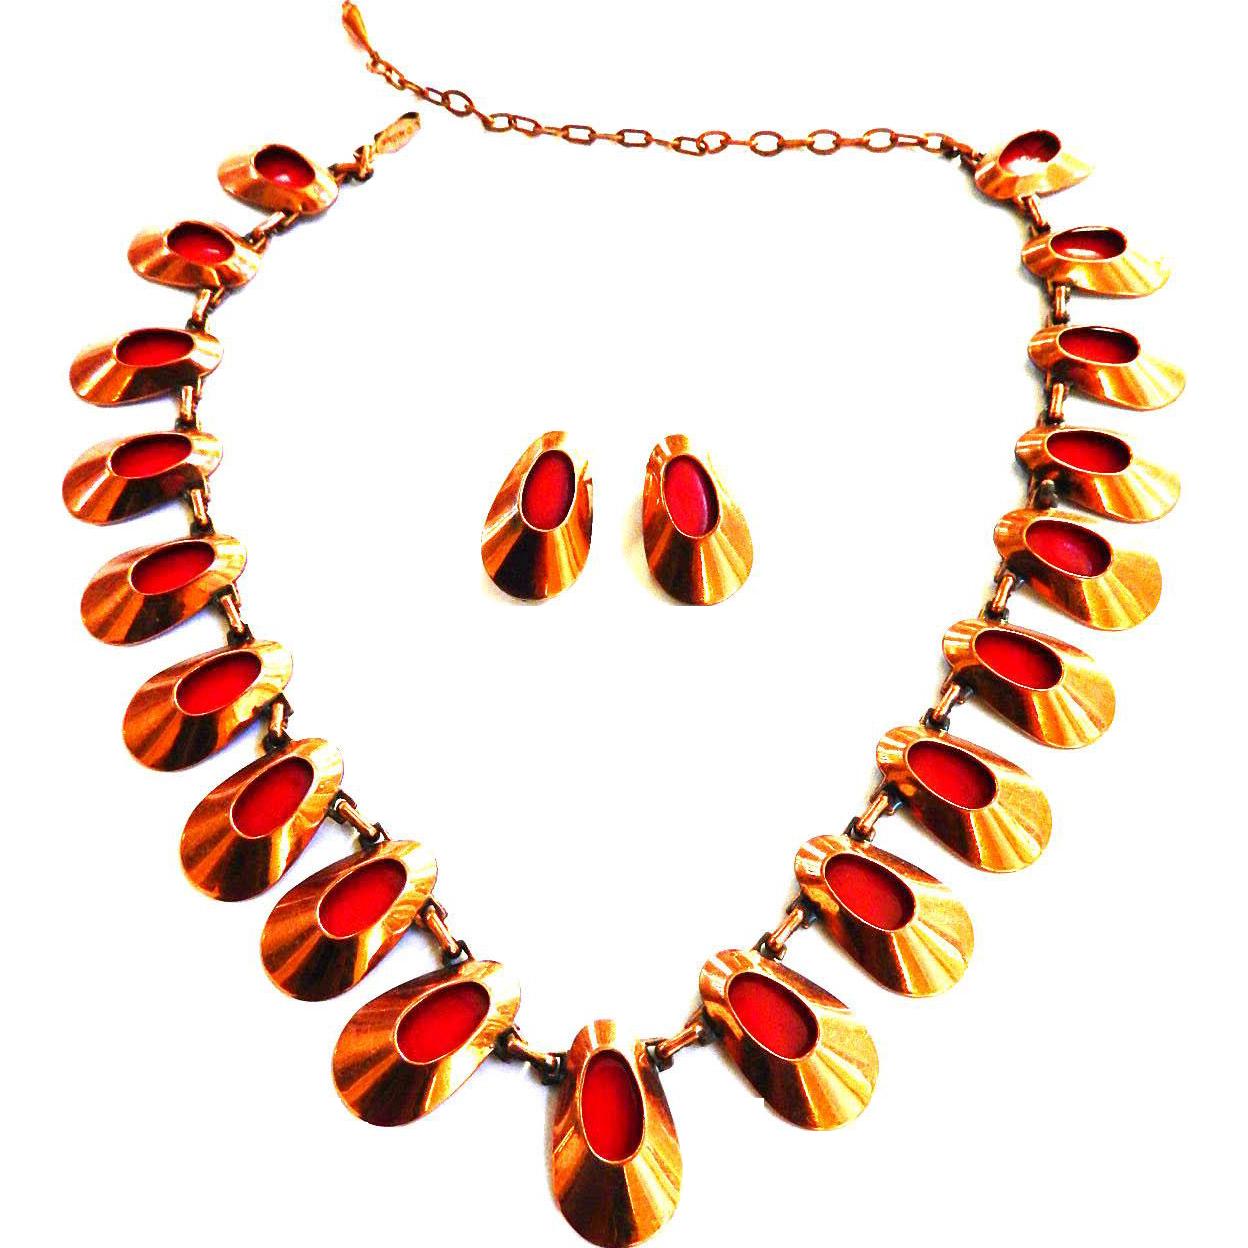 Matisse Copper Enamel Red Honey Bear Necklace And Earrings